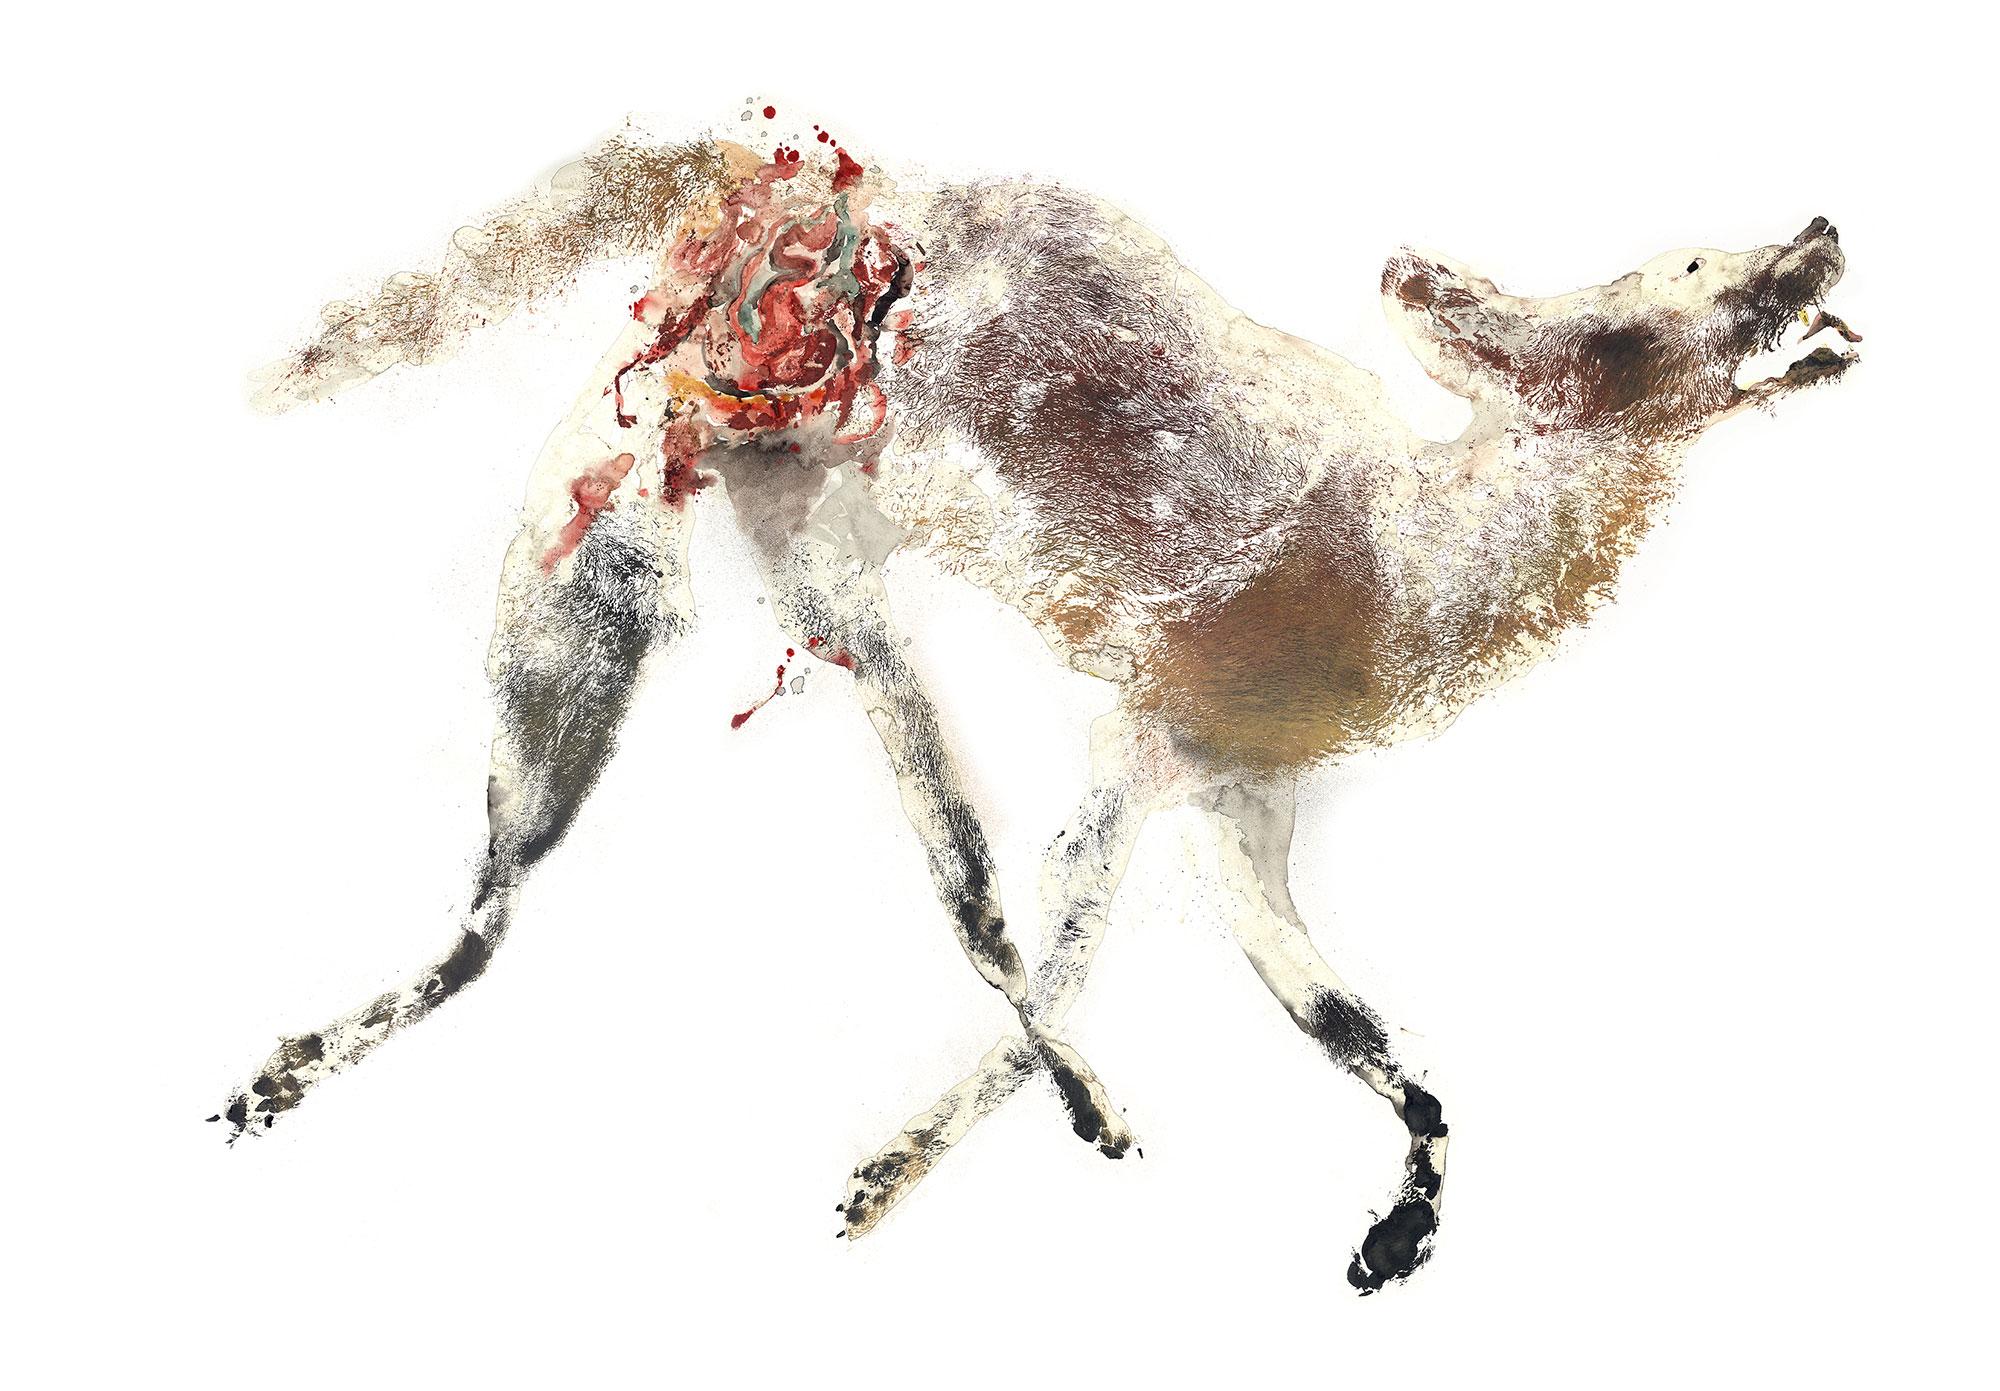 Coyote 1  © Inked Animal  inkedanimal.com